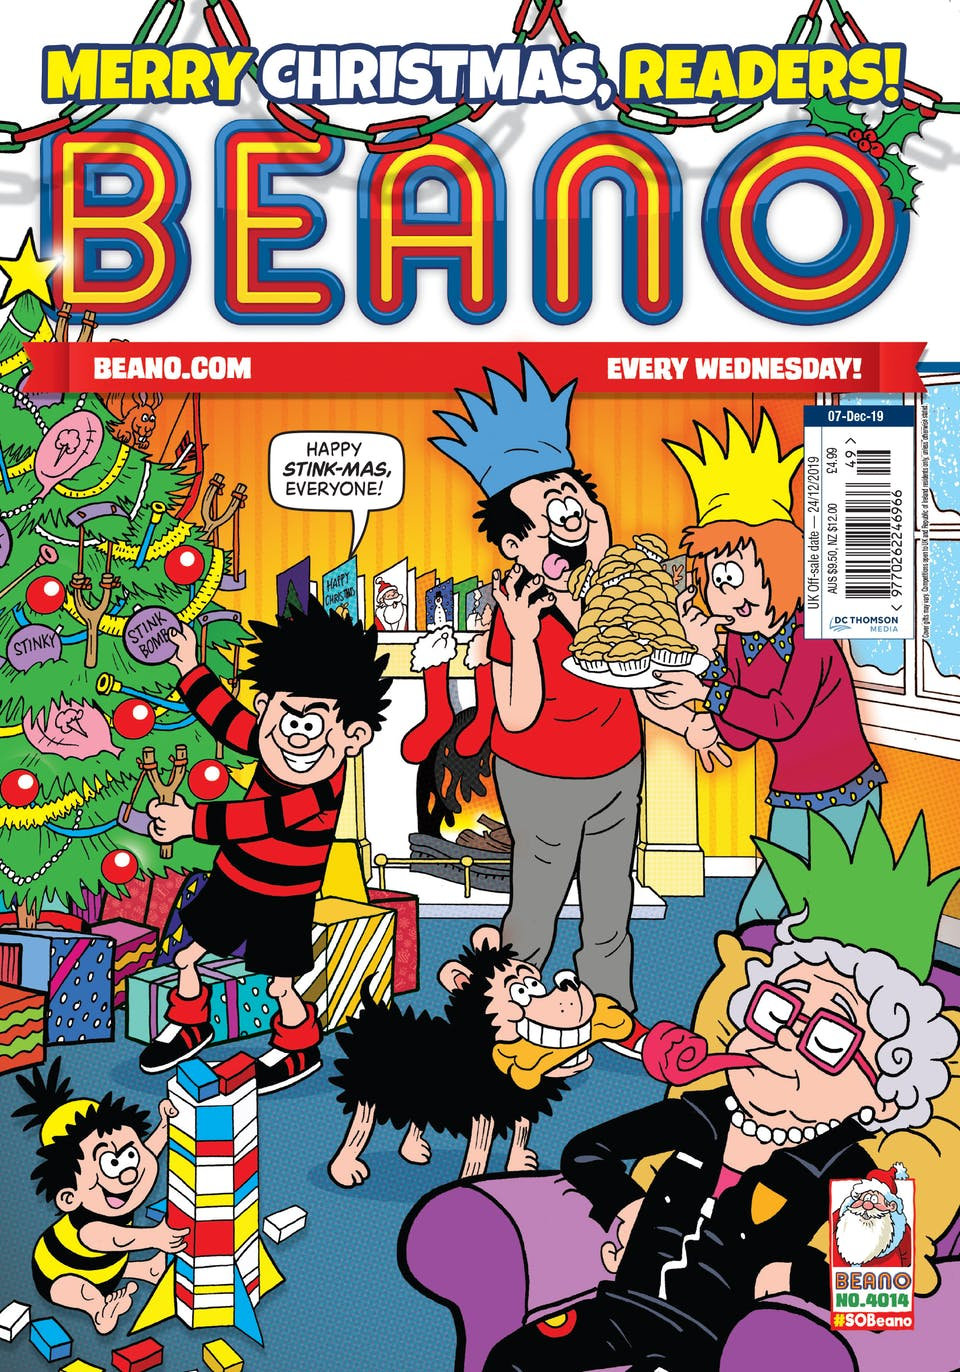 Inside Beano 4014 - Merry Christmas